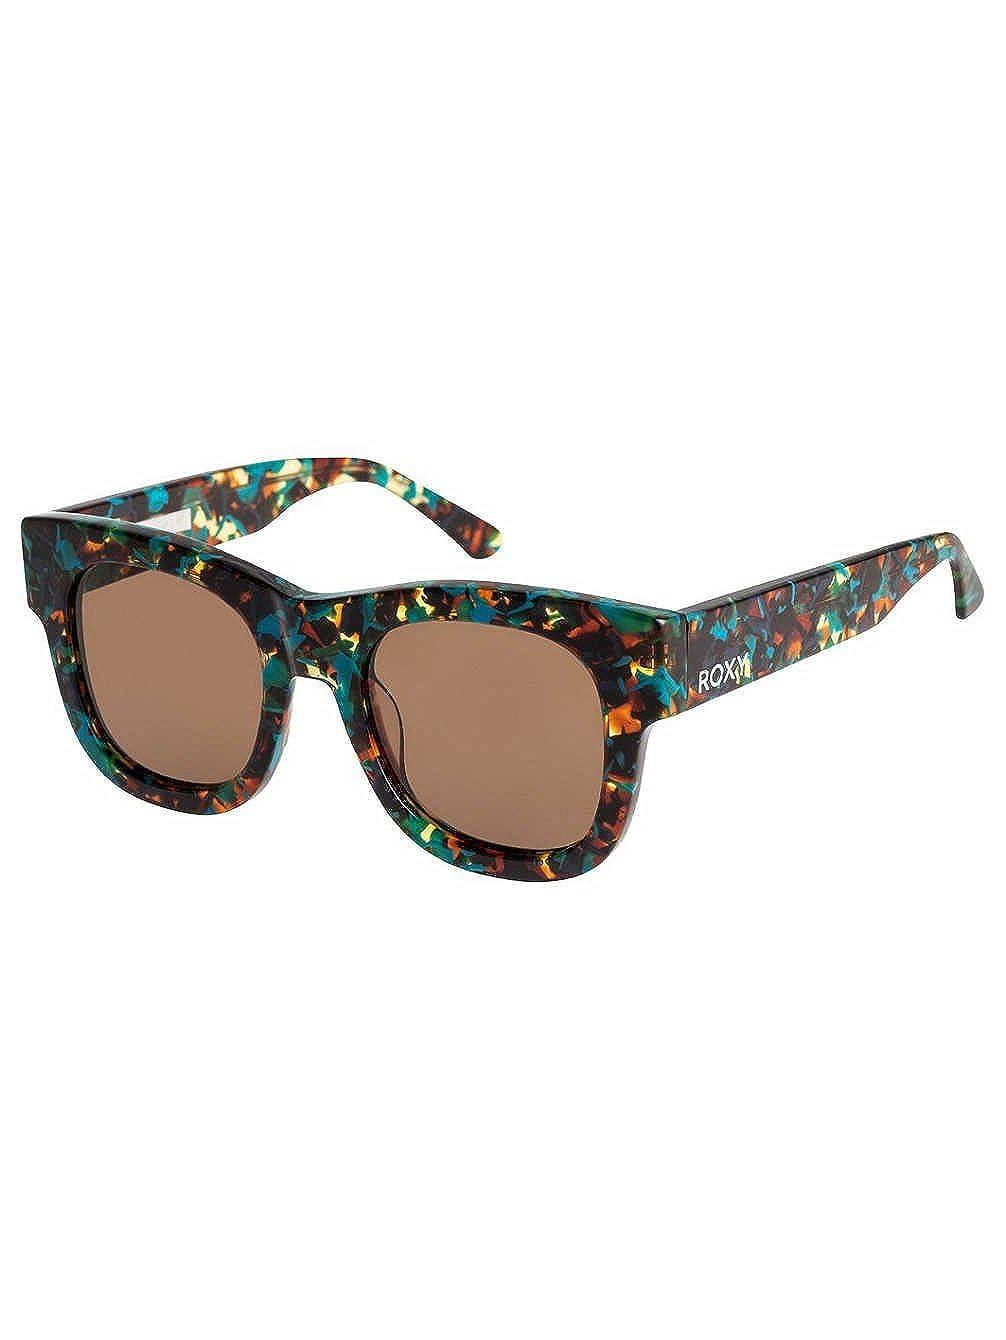 New Women Sunglasses Roxy ERJEY03061 HADLEY XBGC B01N18932P Tortoise